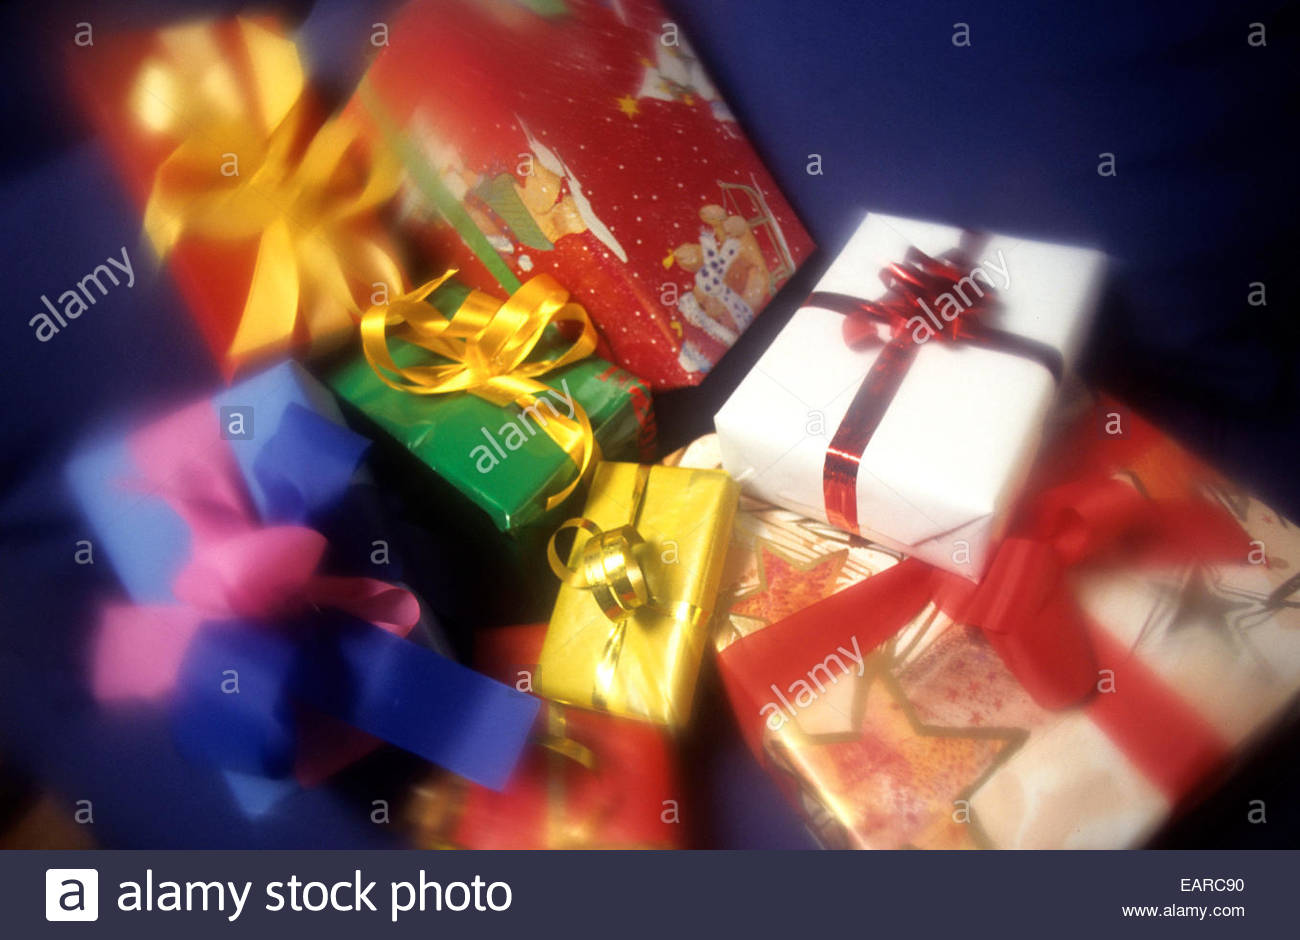 Christmas gifts, France. - Stock Image